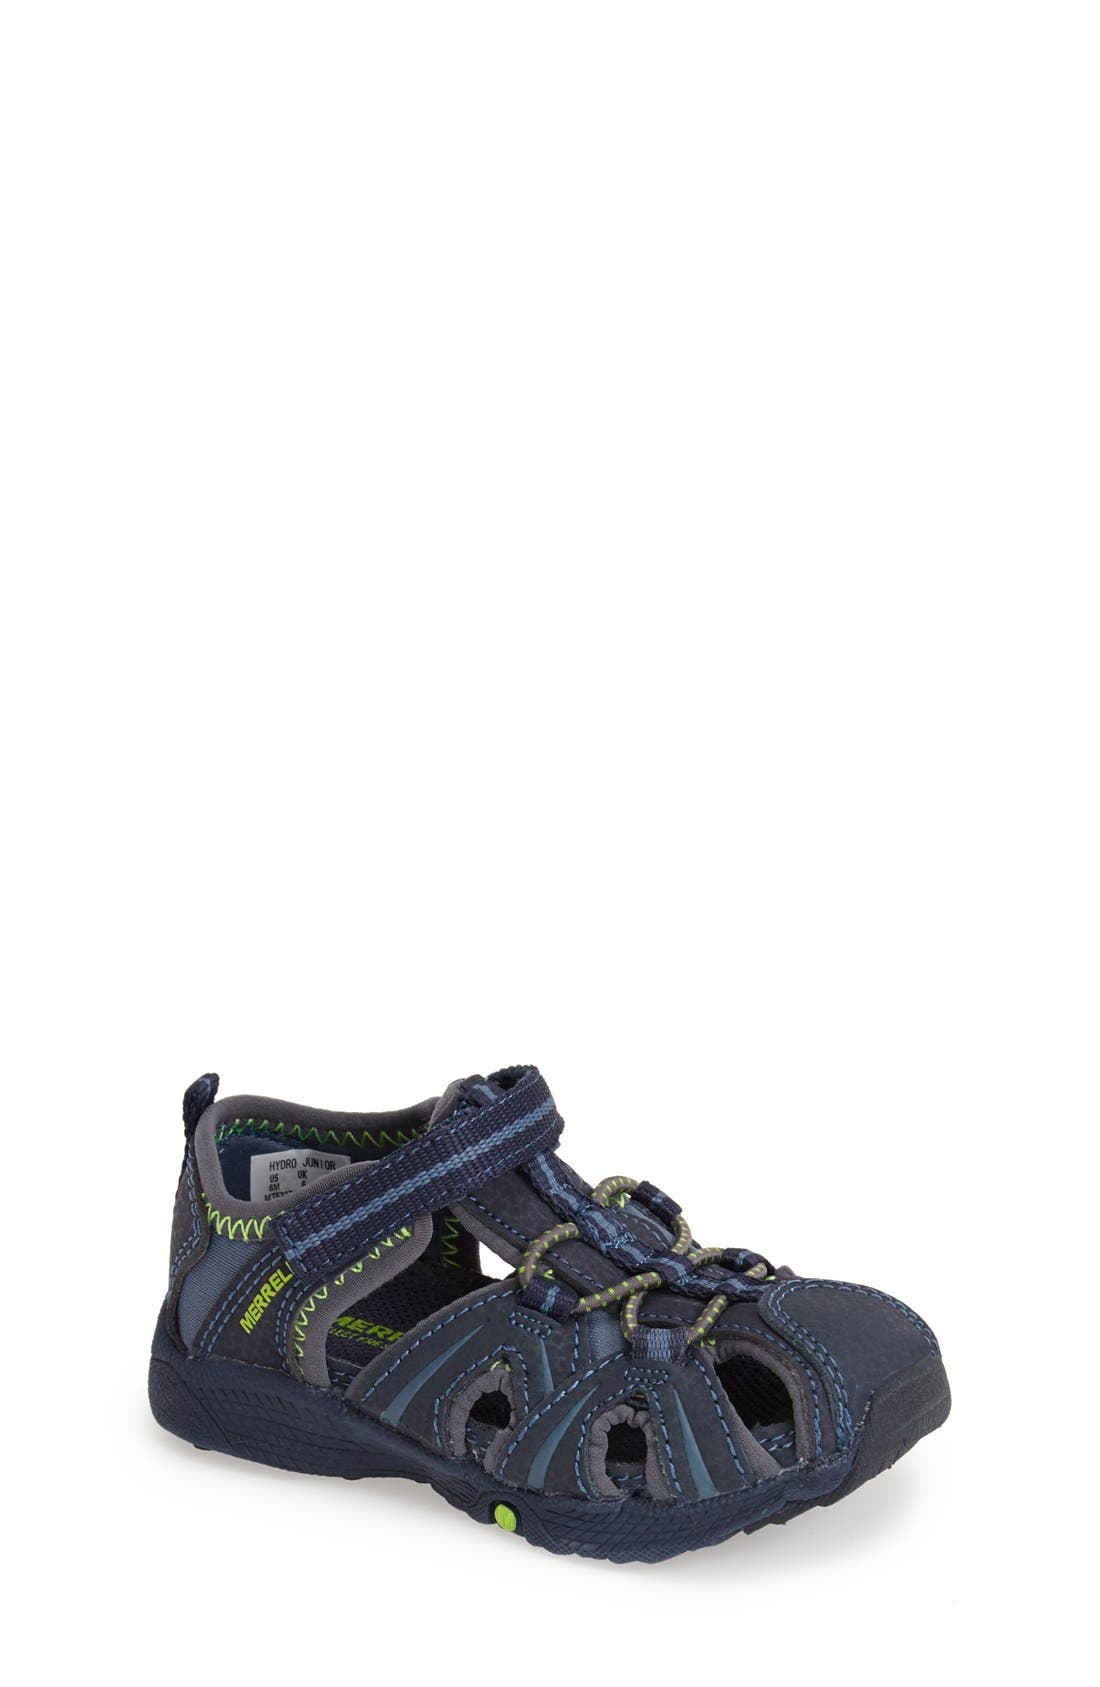 MERRELL, 'Hydro Junior' M-Select Water Sandal, Main thumbnail 1, color, NAVY/ GREEN